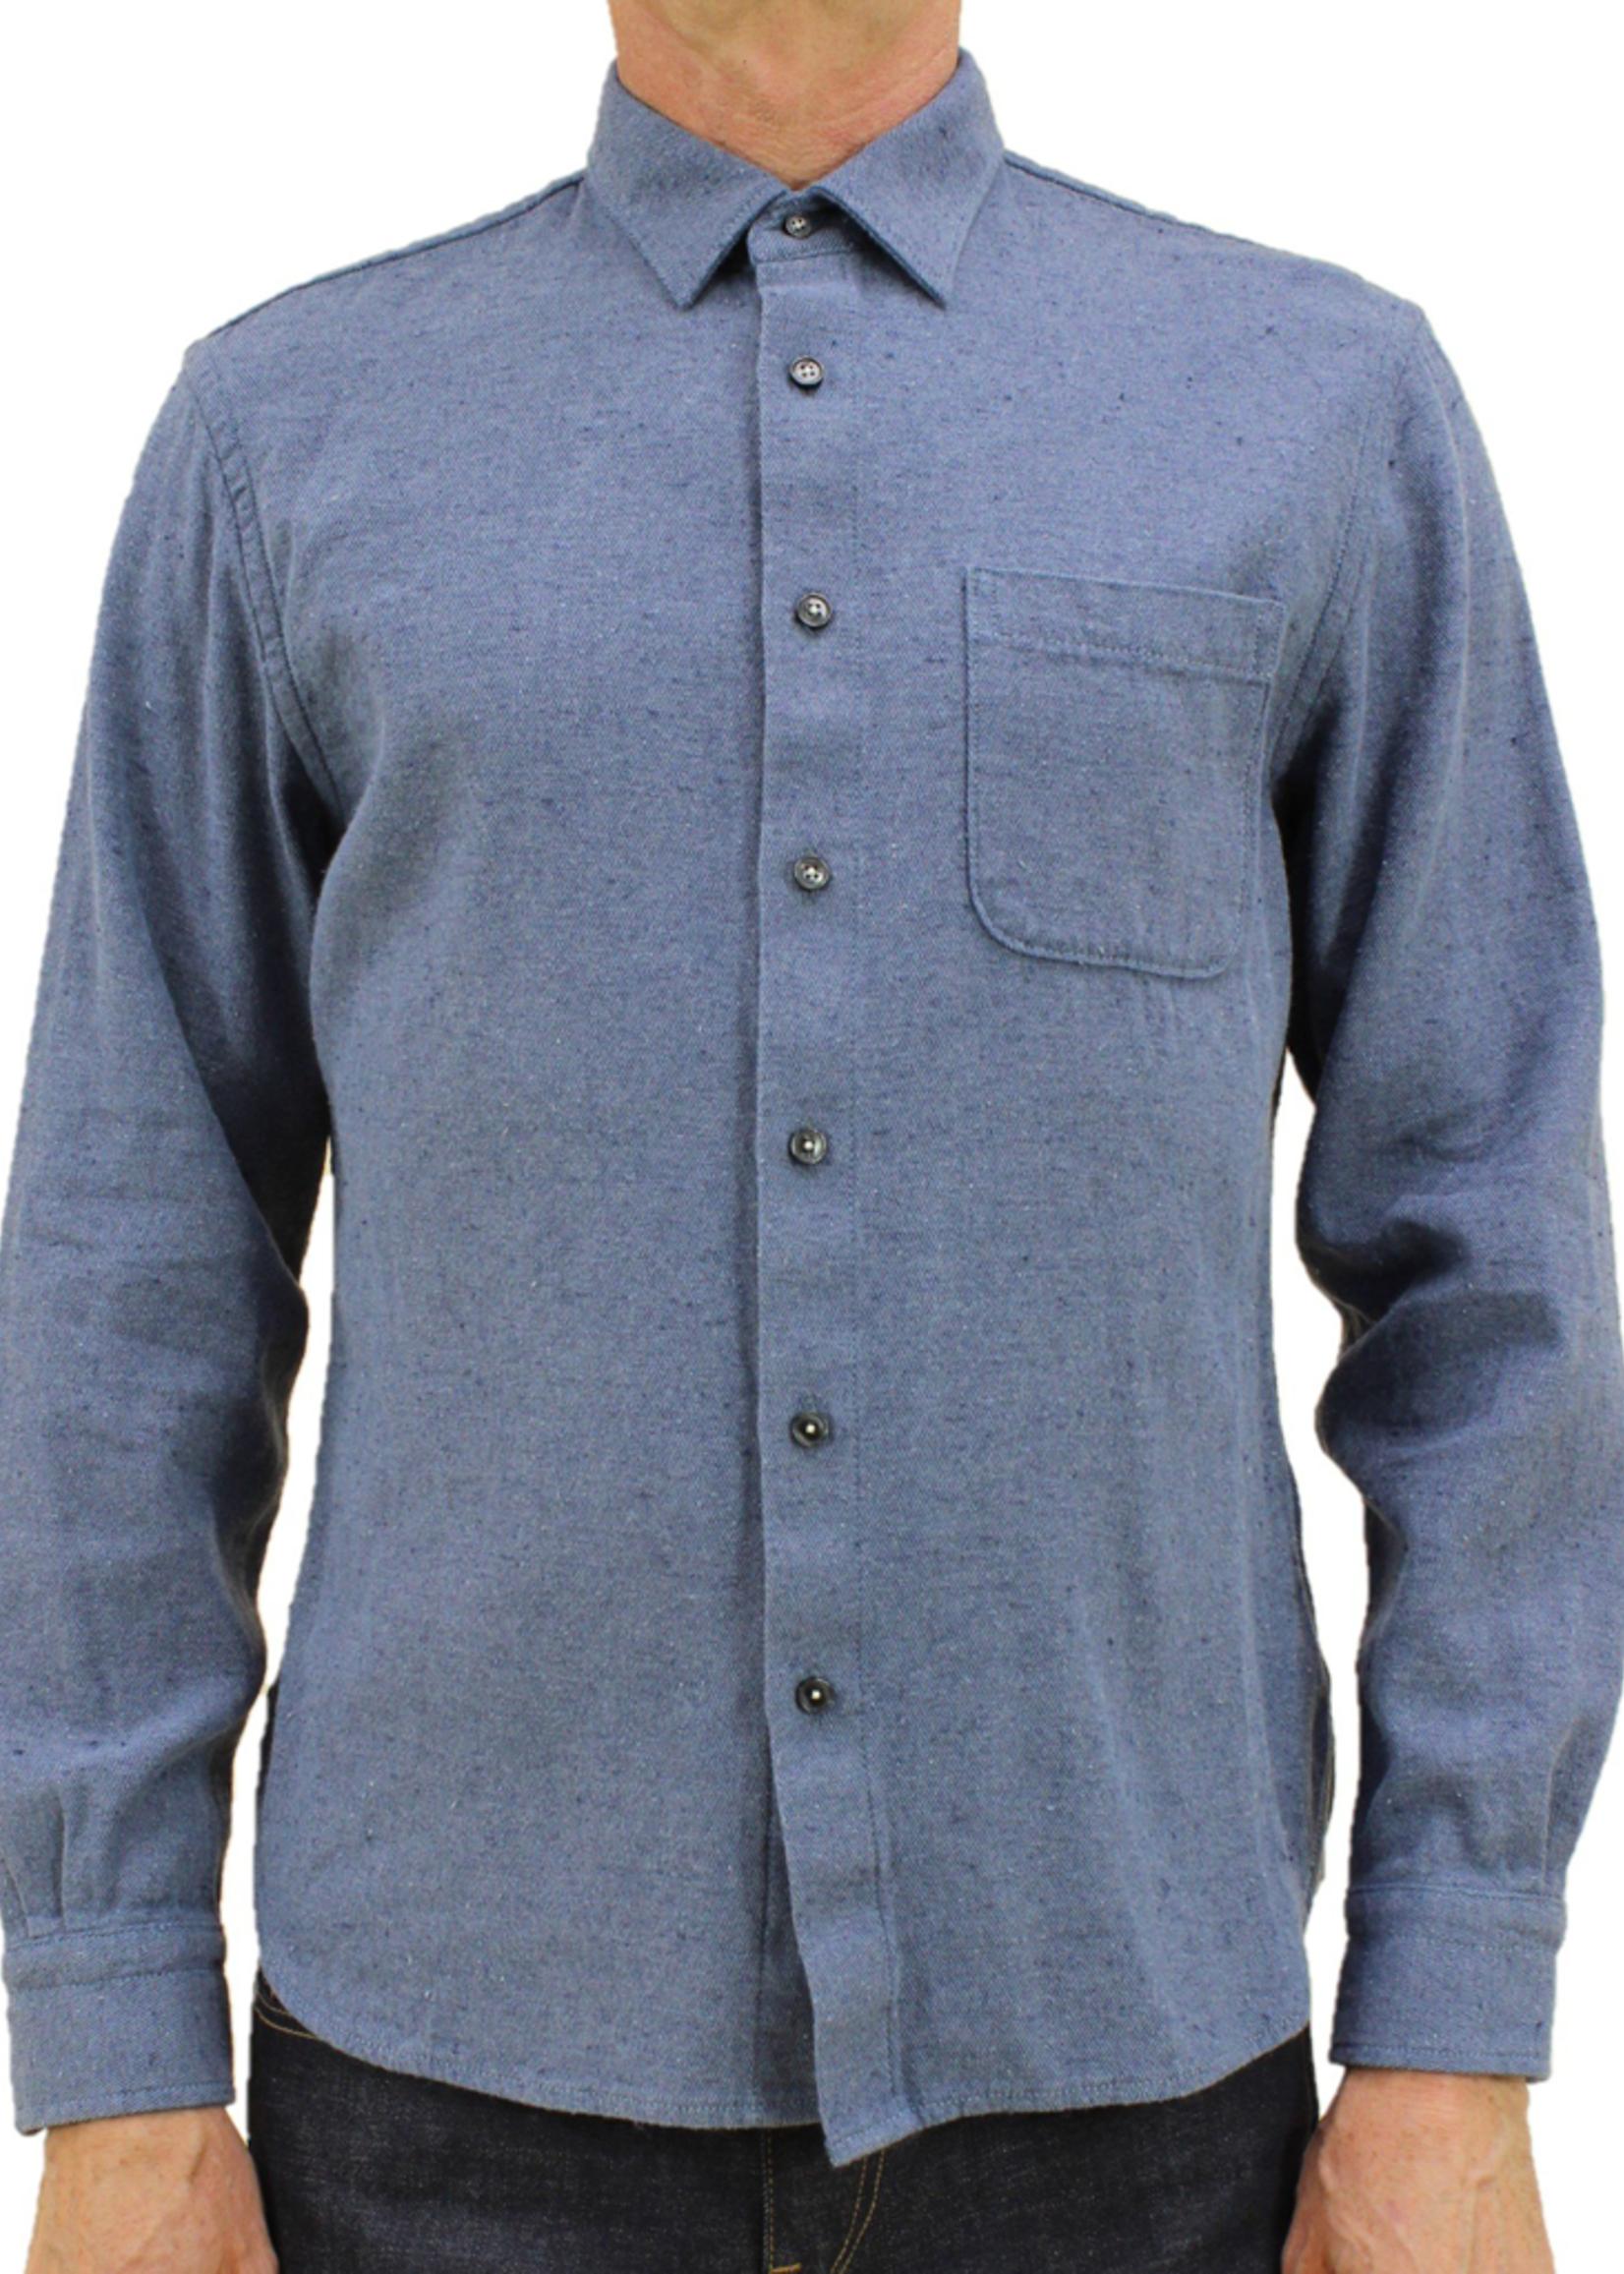 Kato  Kato Ripper Shirt Dark Blue Recycled Denim